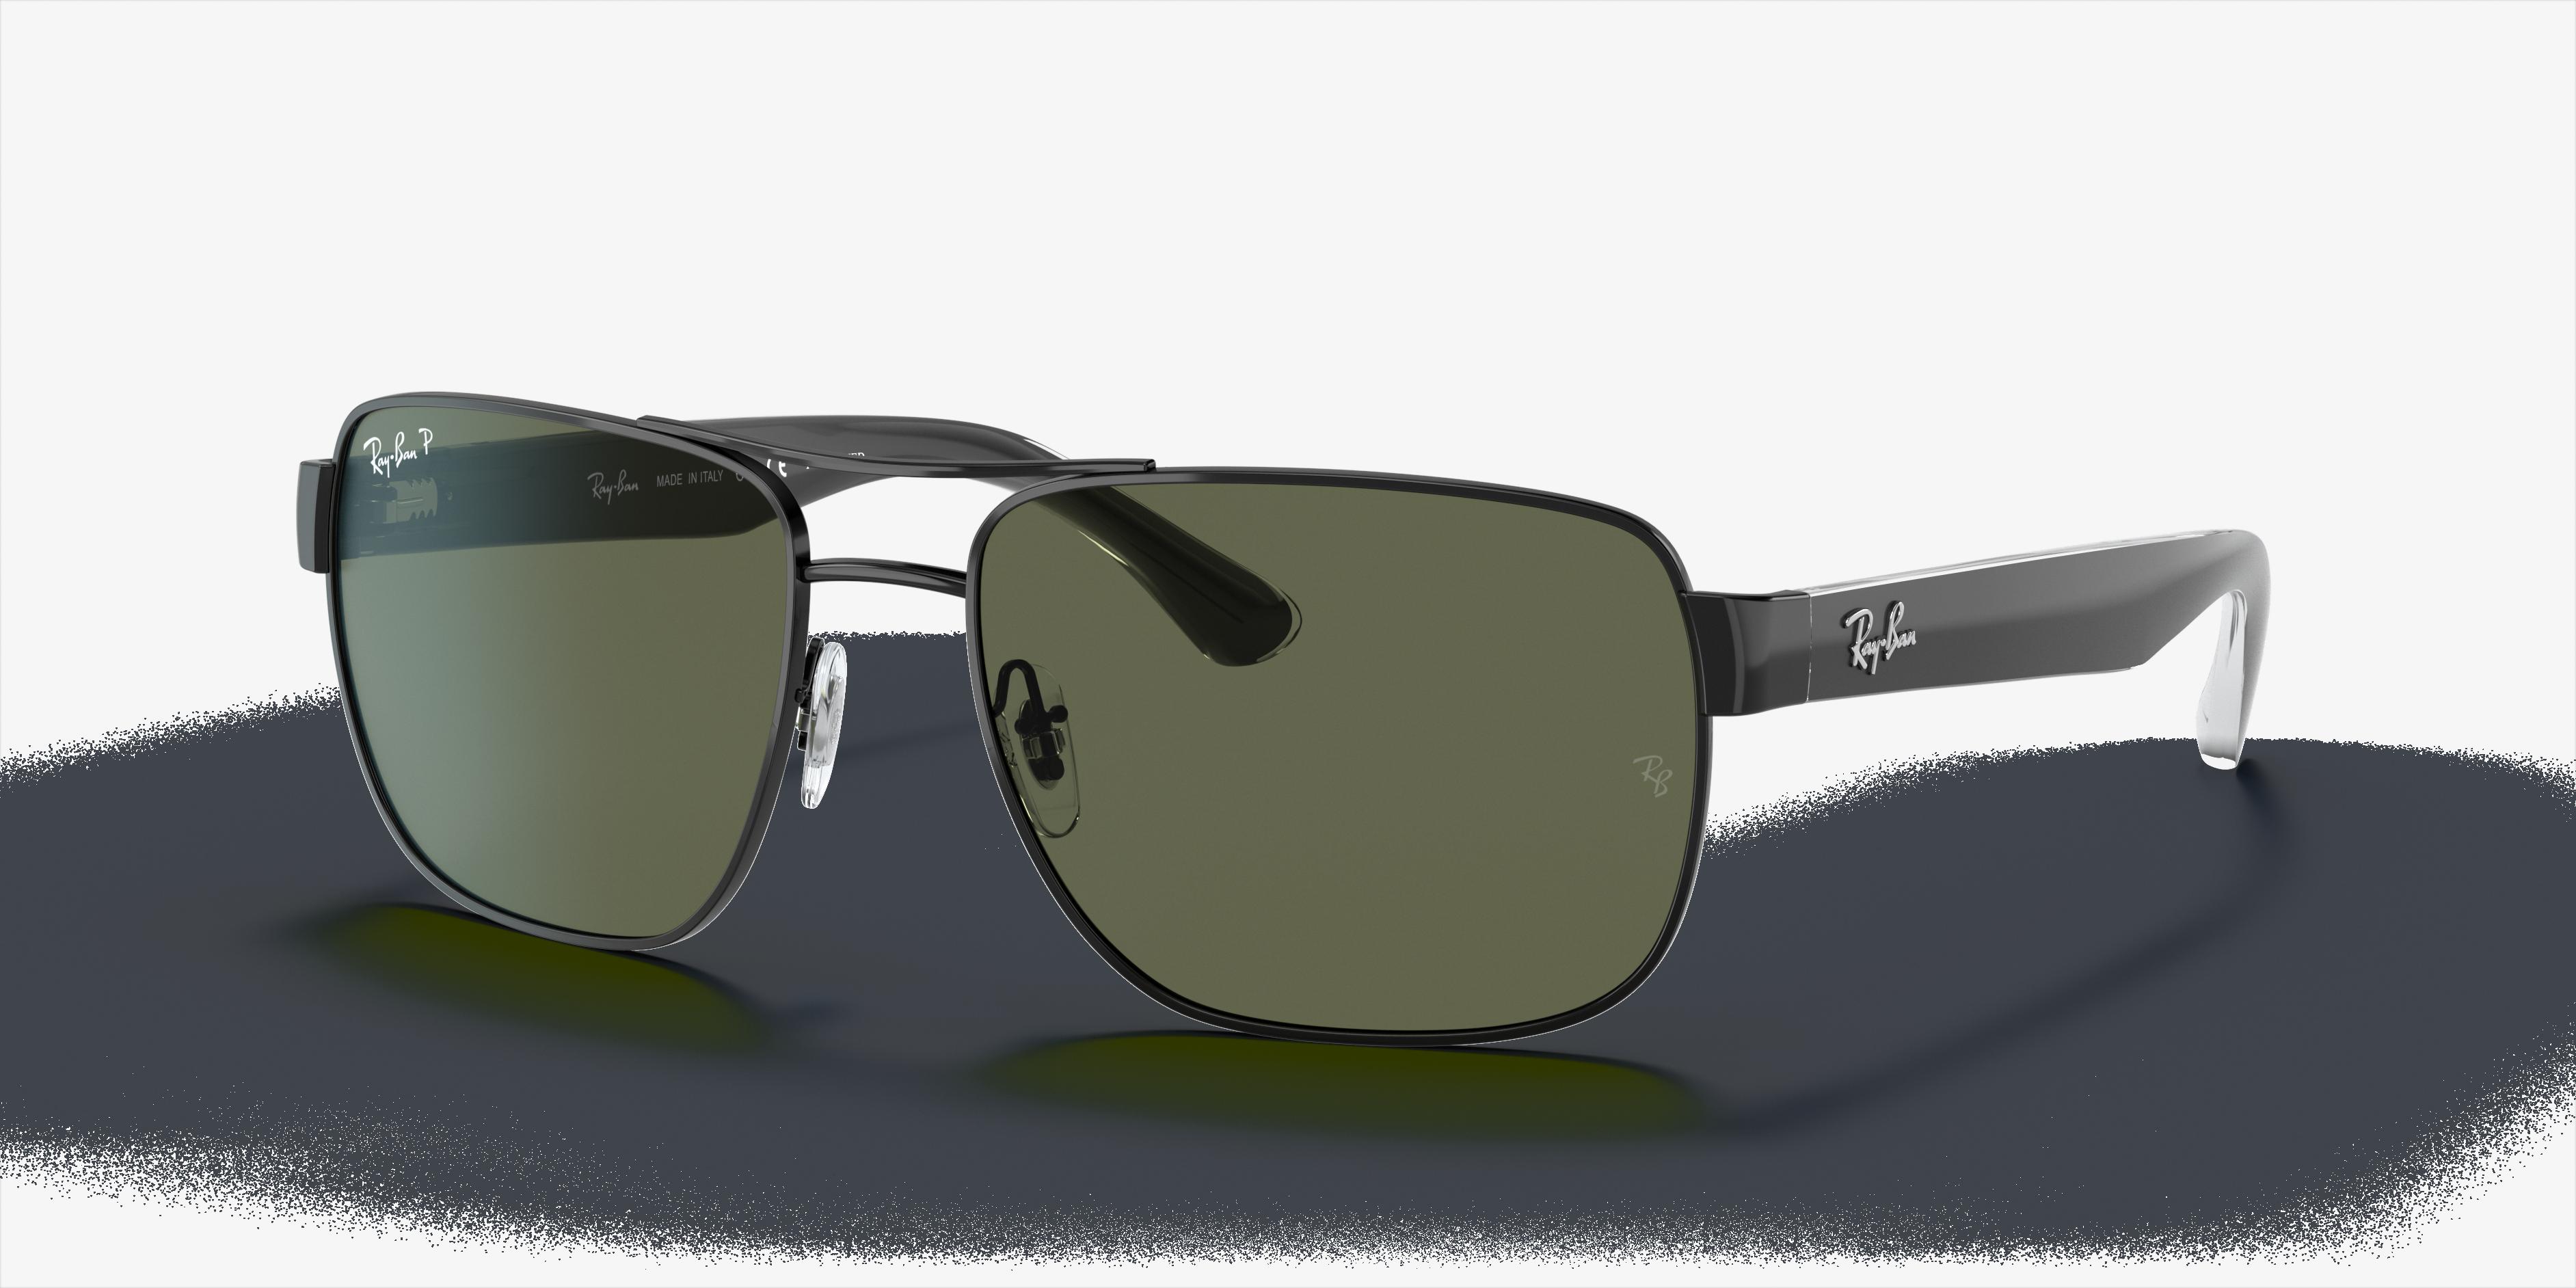 Ray-Ban Rb3530 Black, Polarized Green Lenses - RB3530